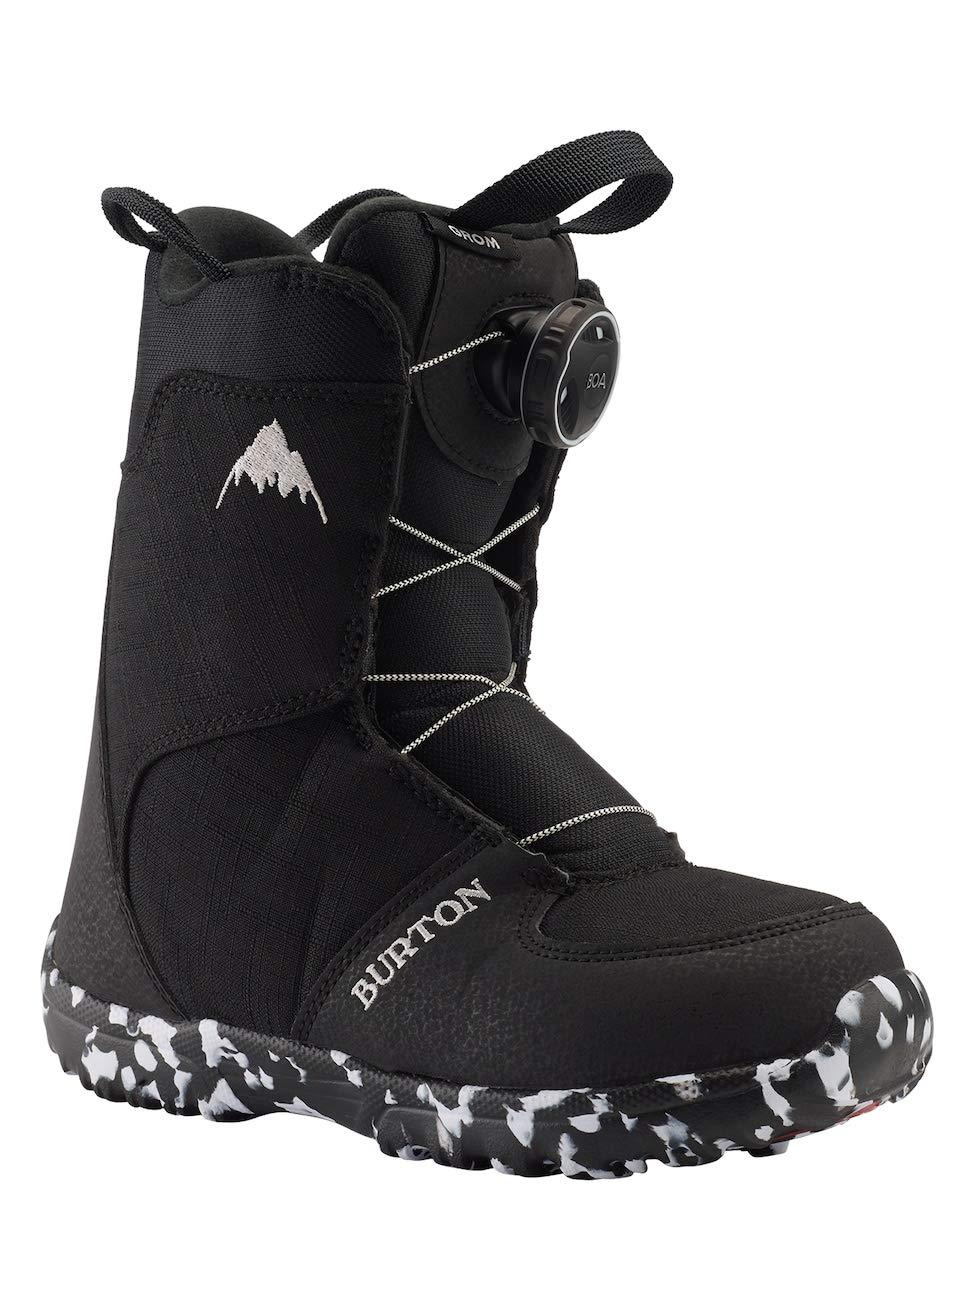 Burton Grom Boa Snowboard Boot 2020 - Black